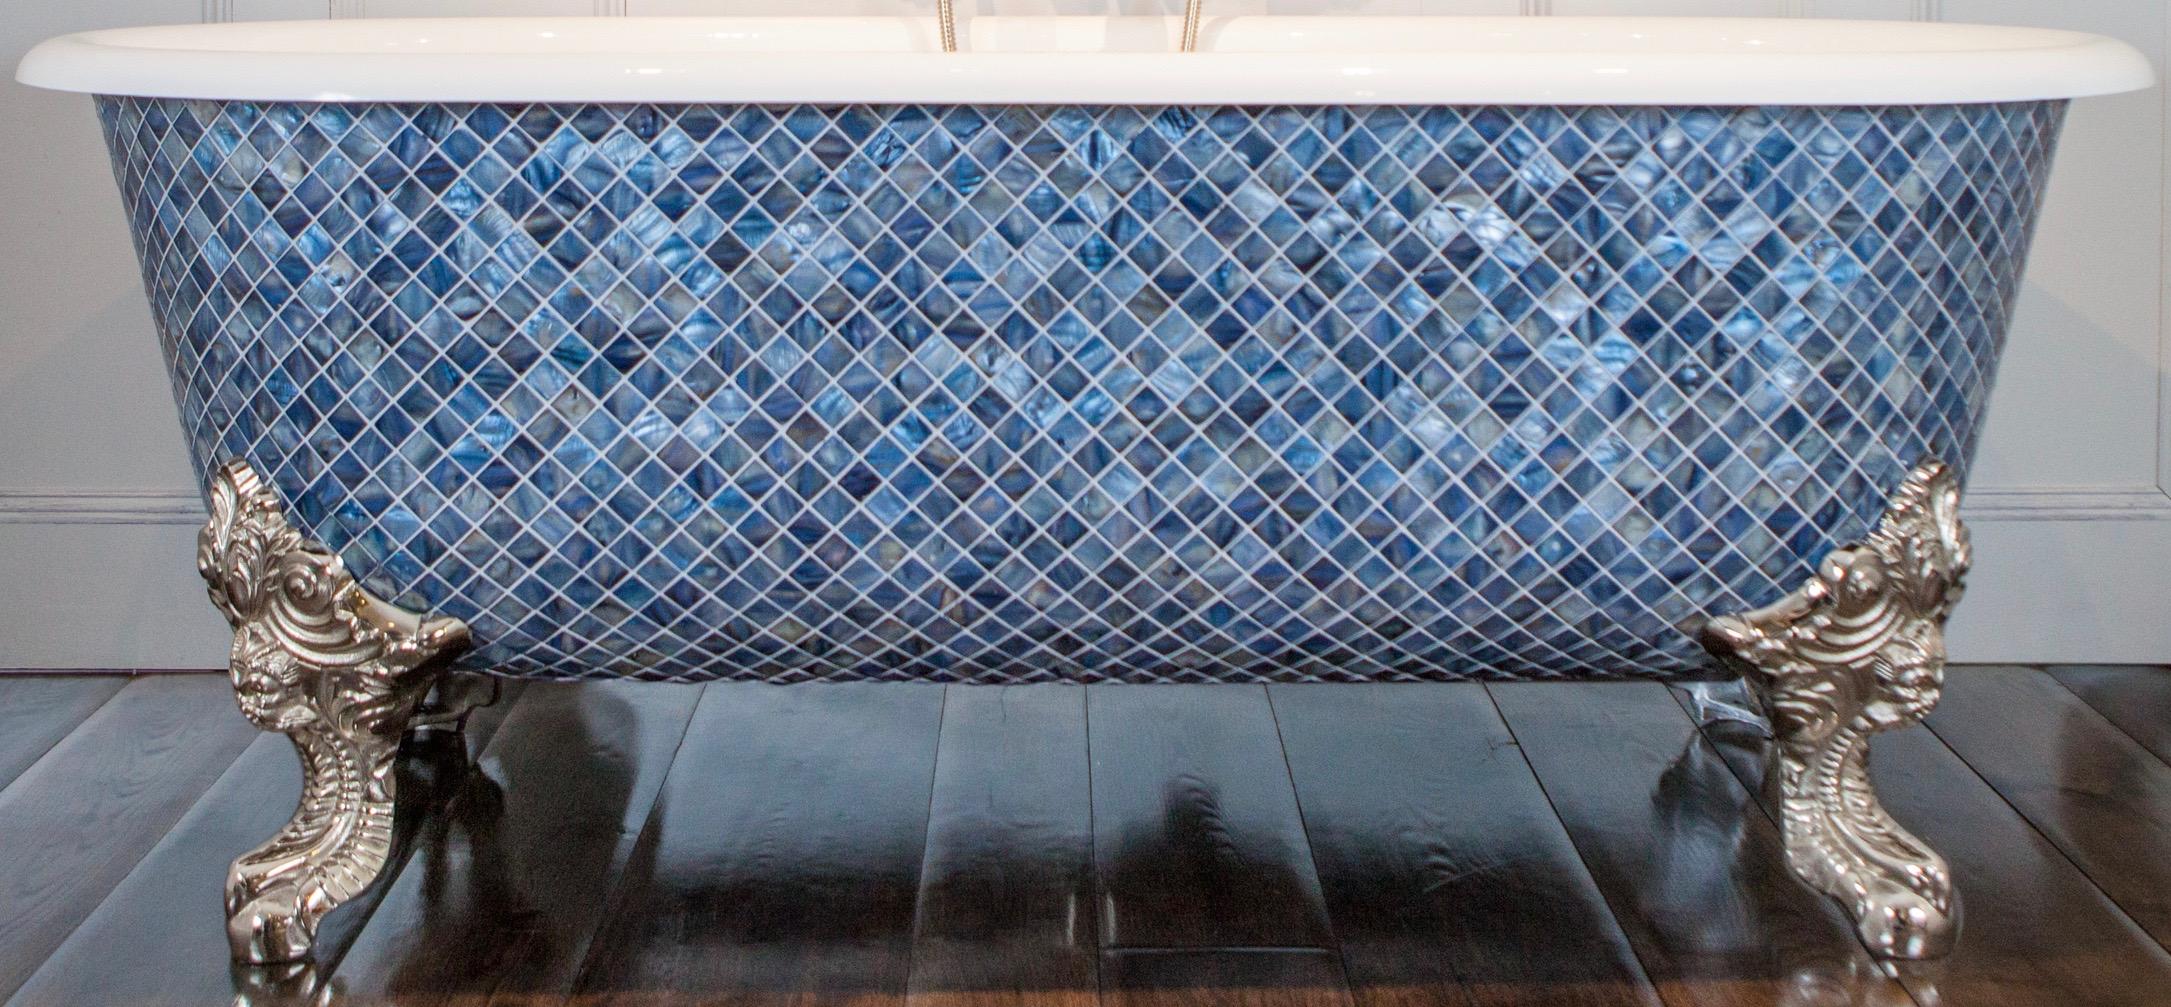 free standing blenheim bath blue mother of pearl mosaic exterior